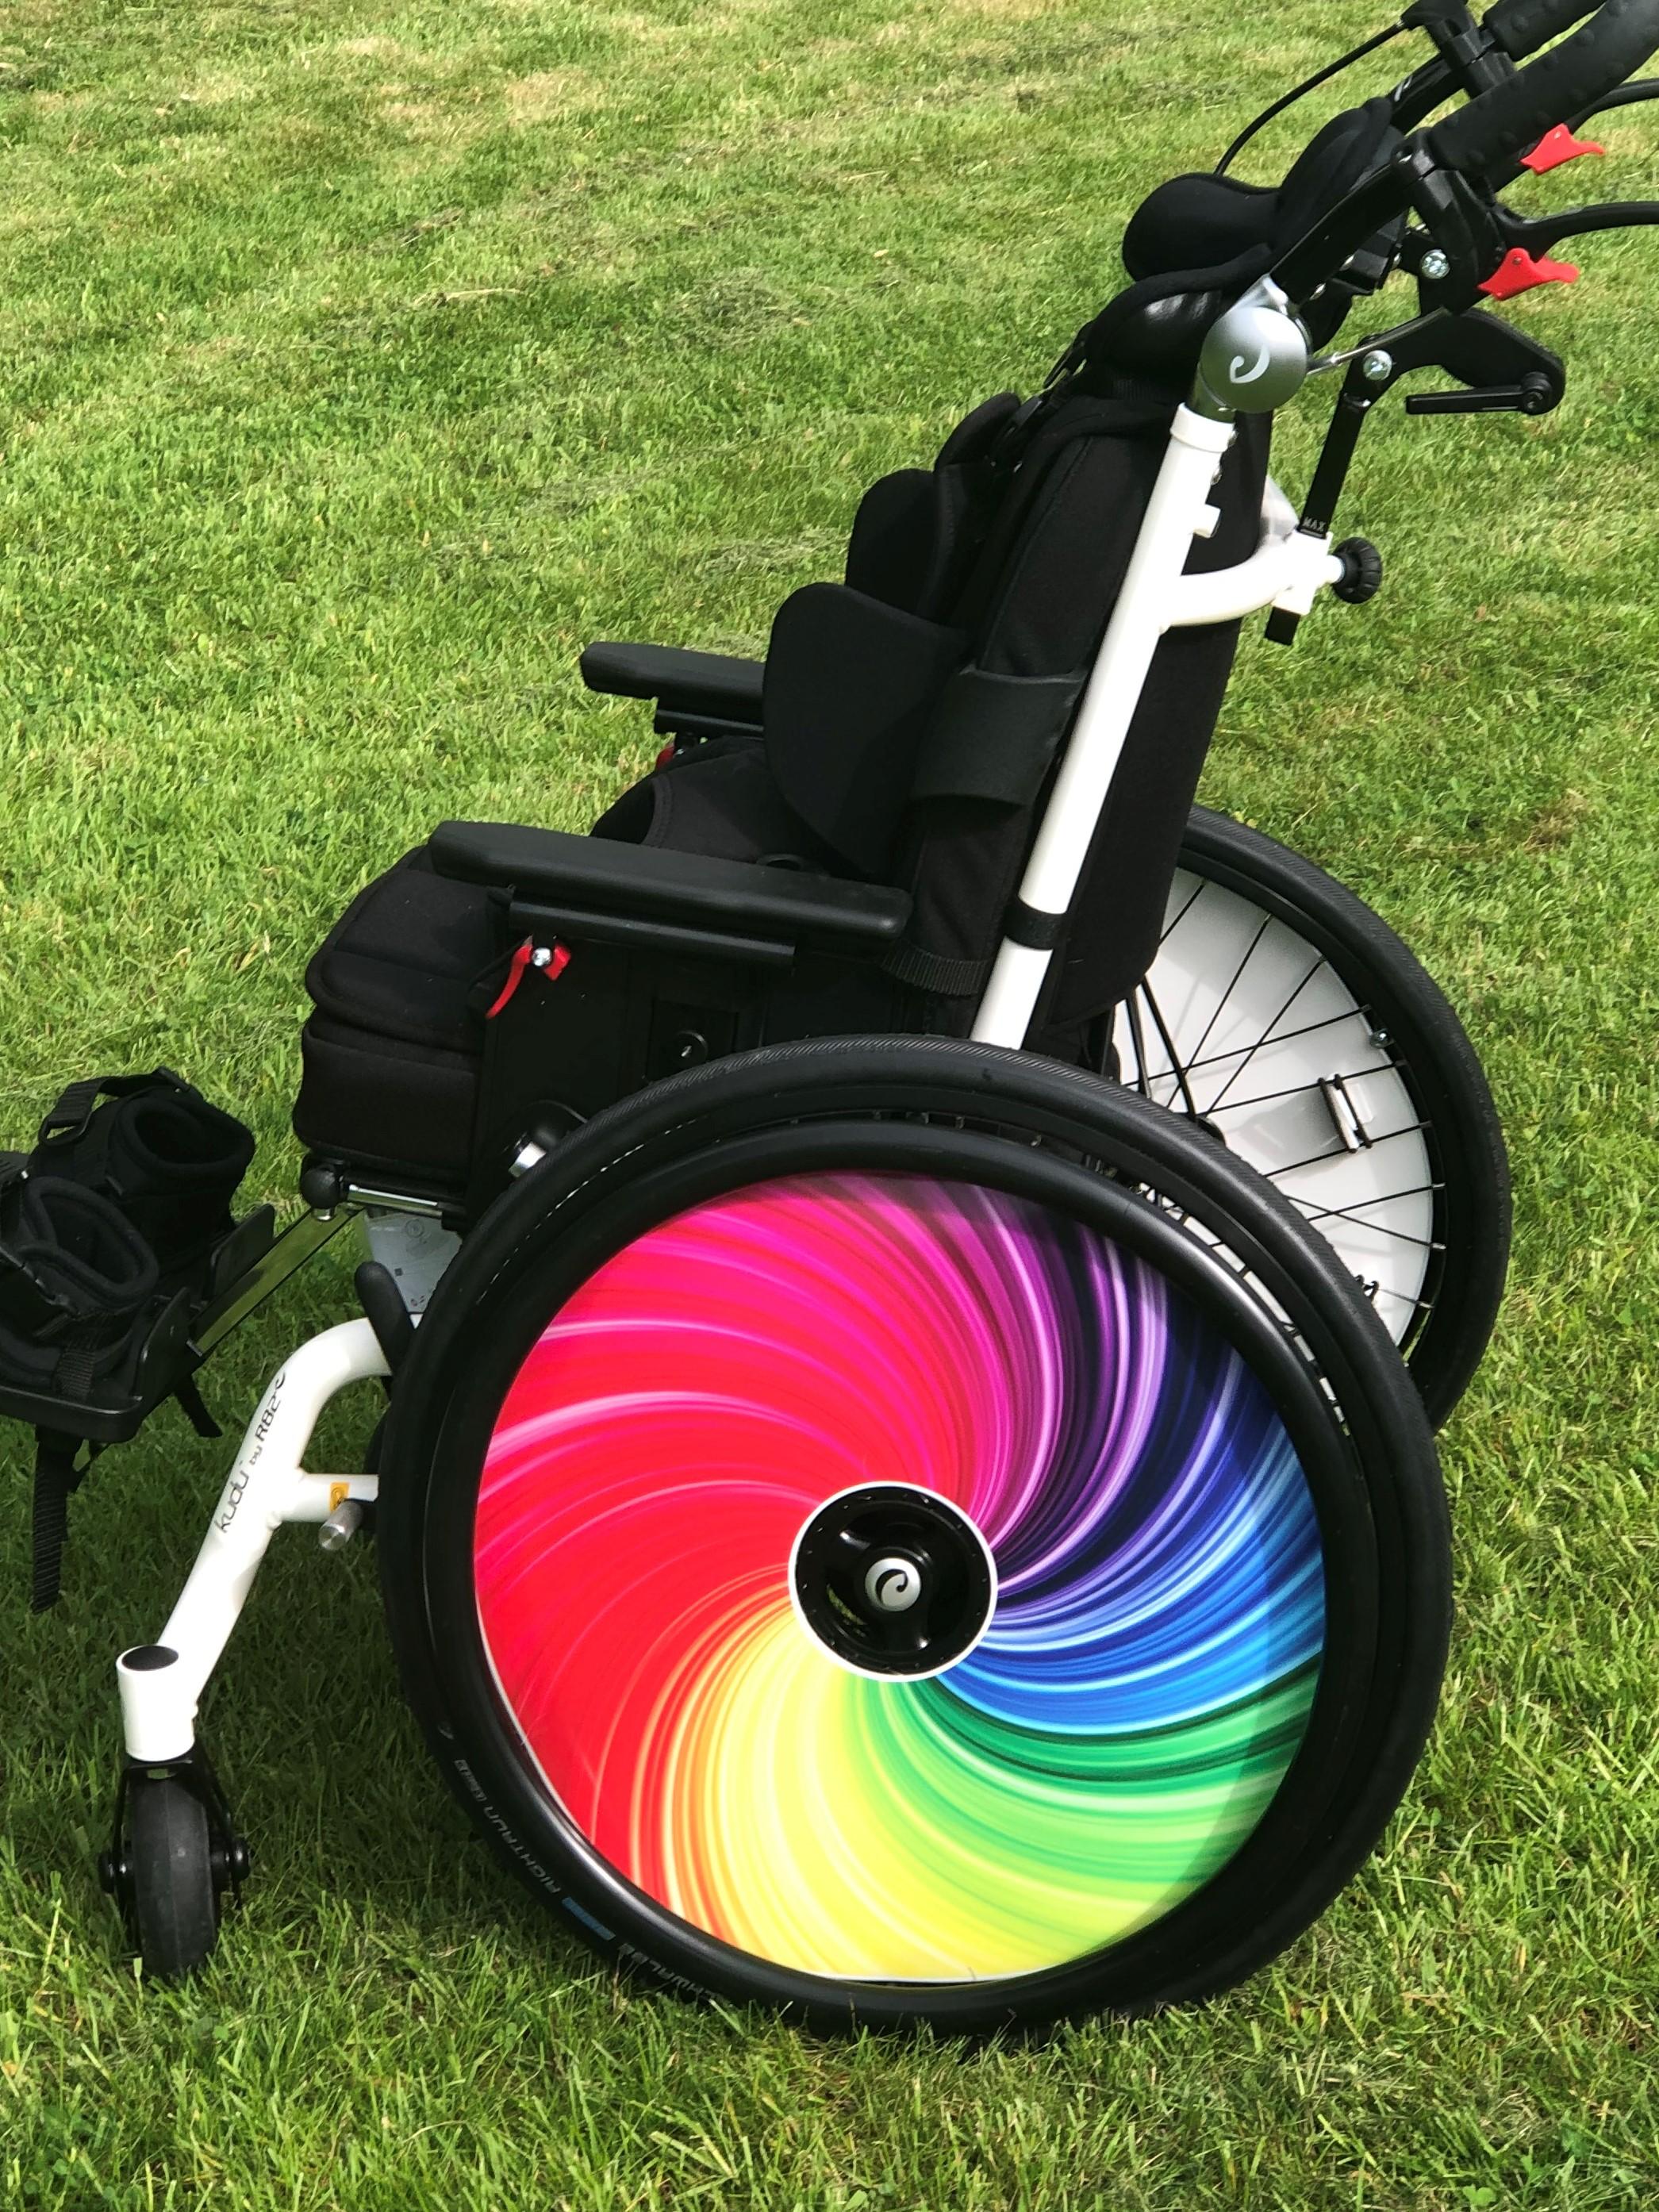 Mira's Rainbow SpokeGuards Wheel Covers